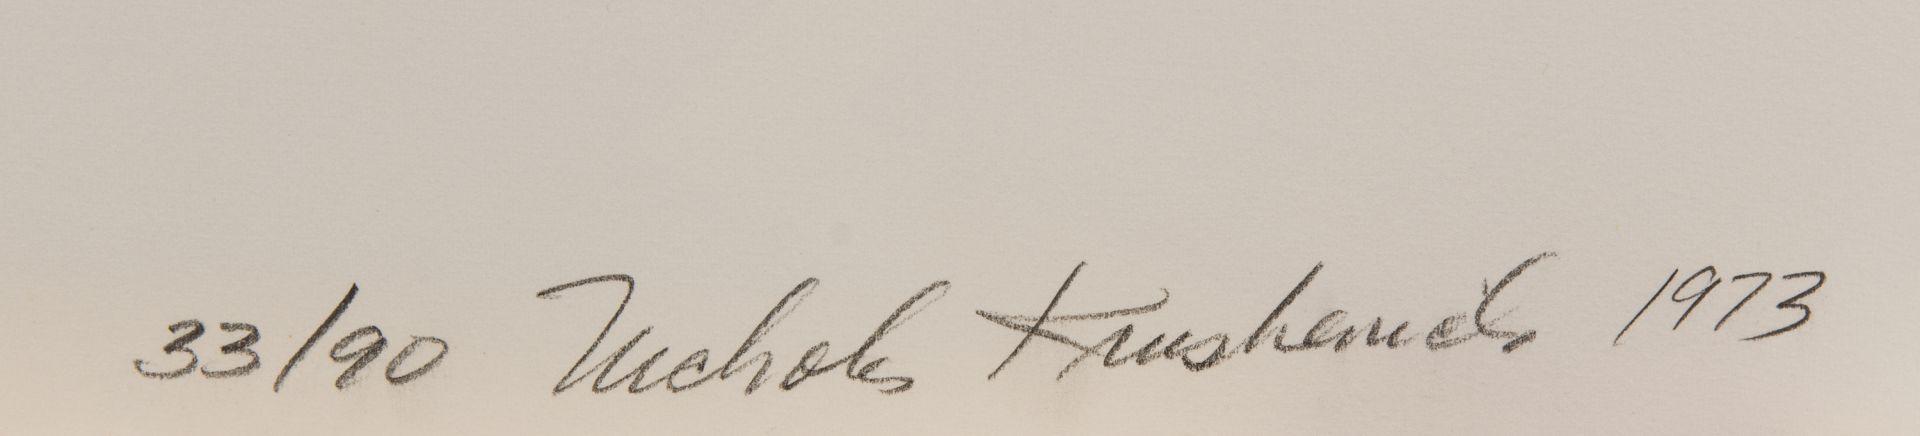 Signature Nicholas Krushenick